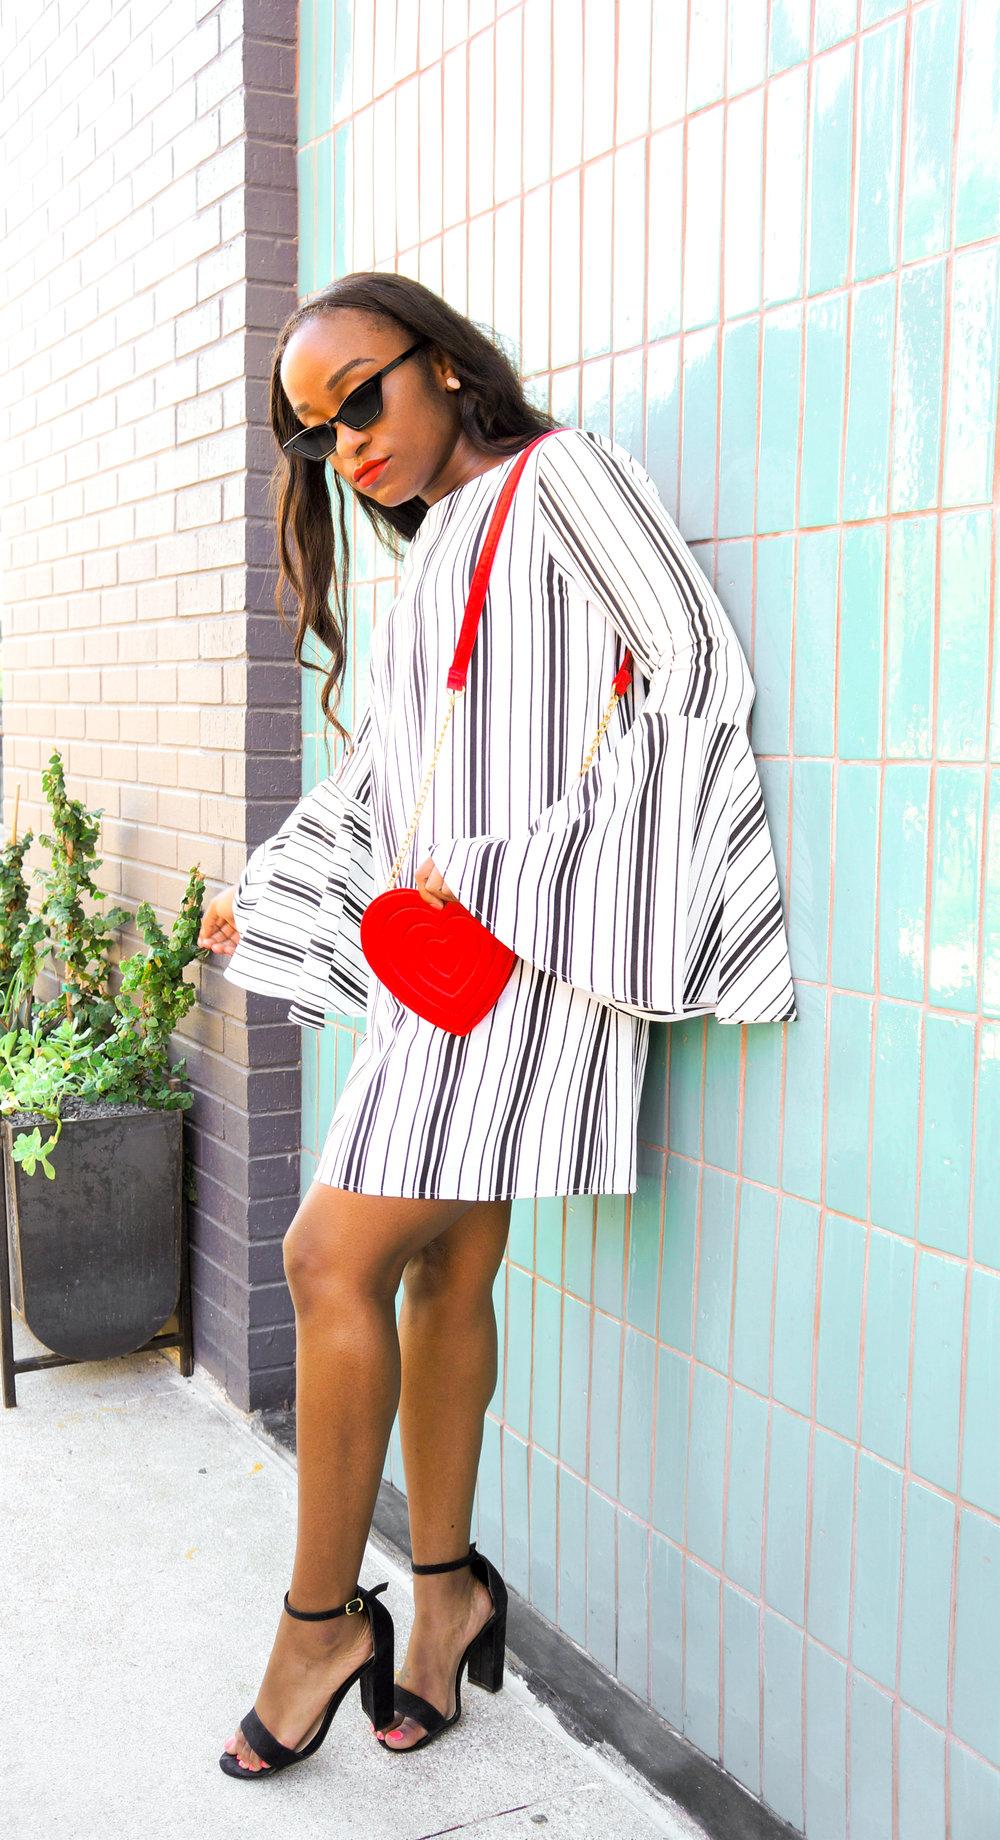 THE DEETS:  Low Key Low Cut Striped Day Dress -   AKIRA  ; Heart Bag -   Monki  ; Ema High Block Heel Pumps -   Target  ; Cat Eye Sunglasses -   Attention Frames